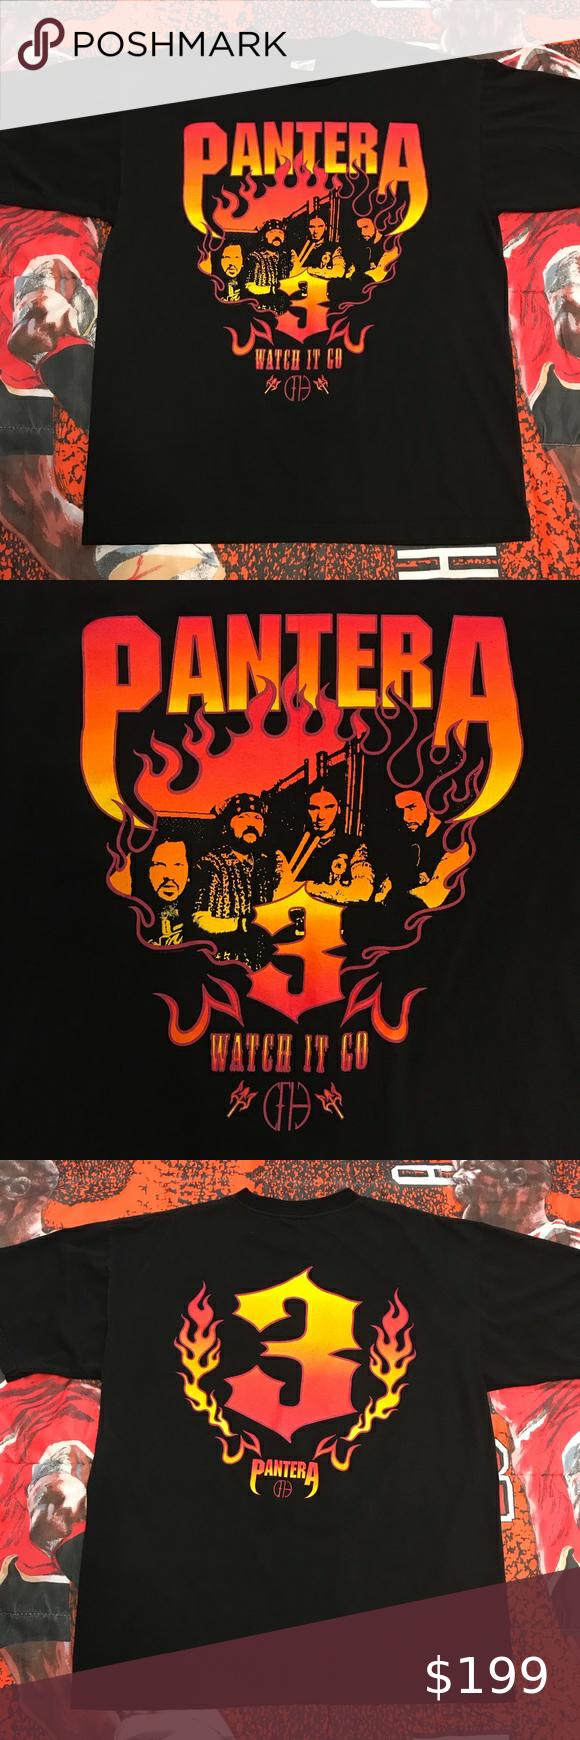 Pantera Logos De Bandas Pantera Band Pantera